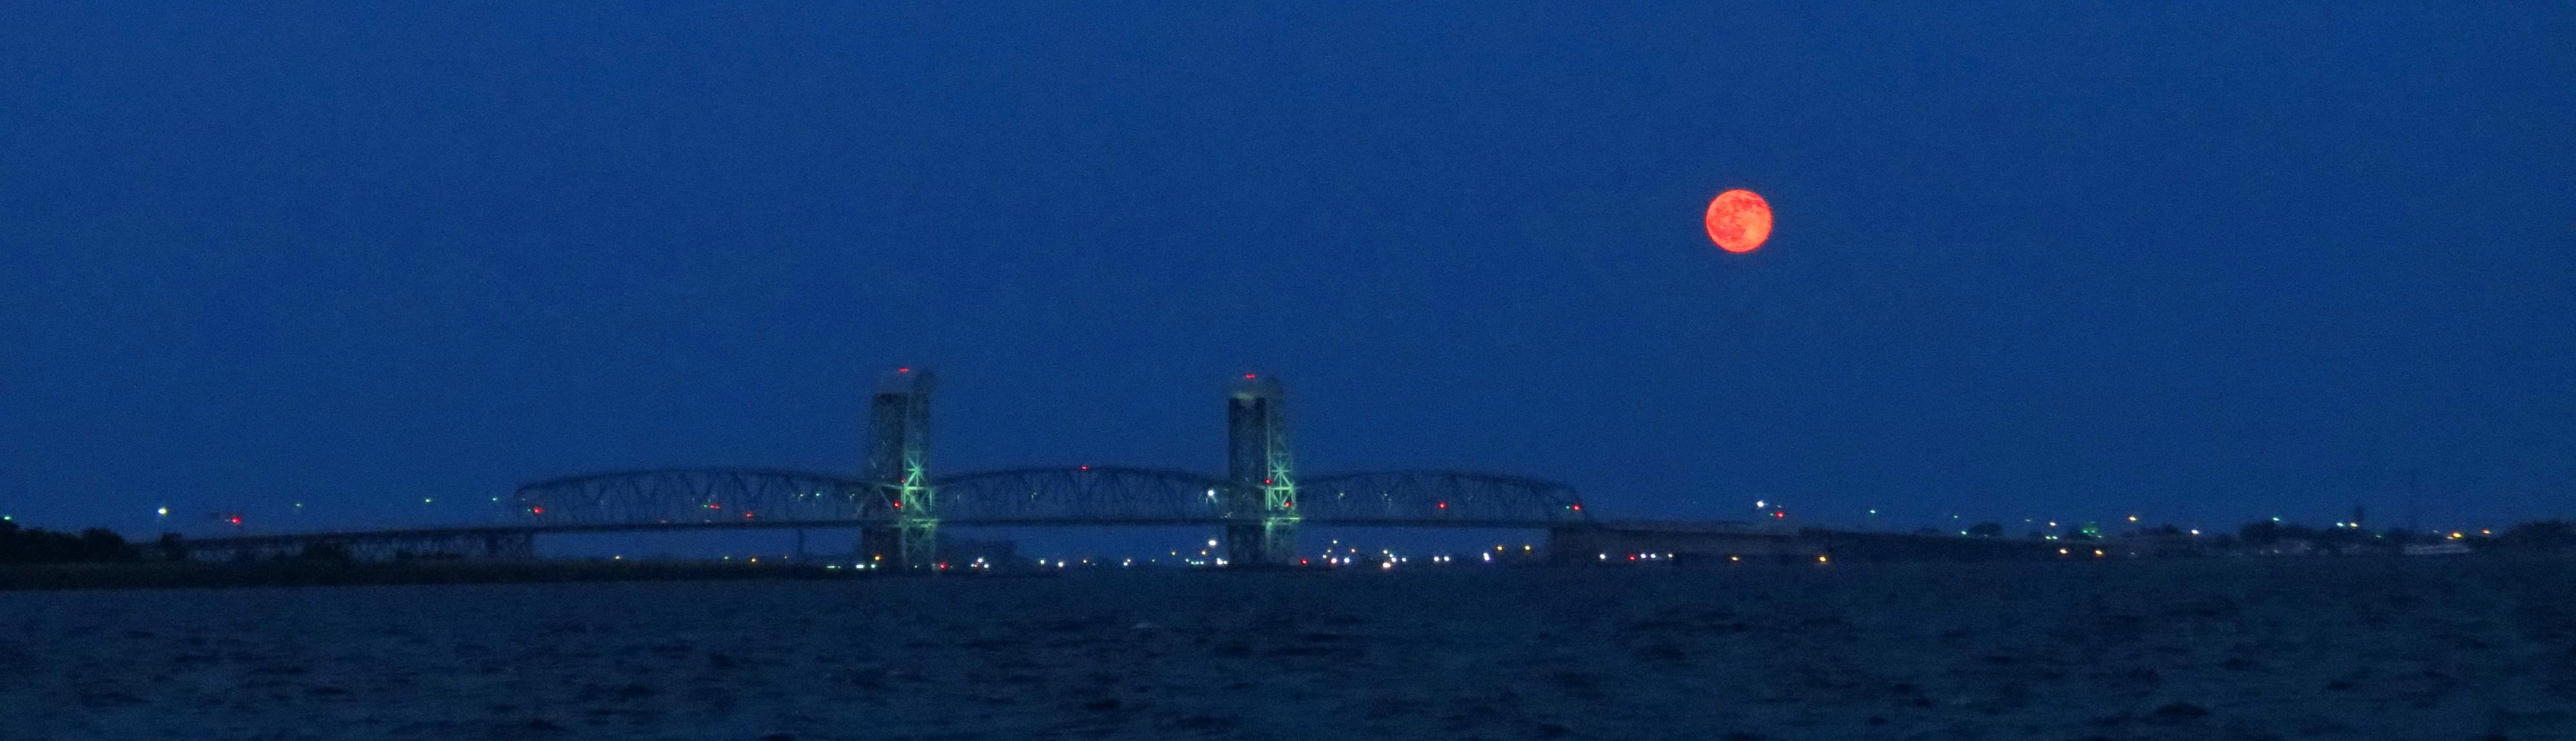 Plumb Beach - Full Moon Rising Over the Marine Parkway Bridge